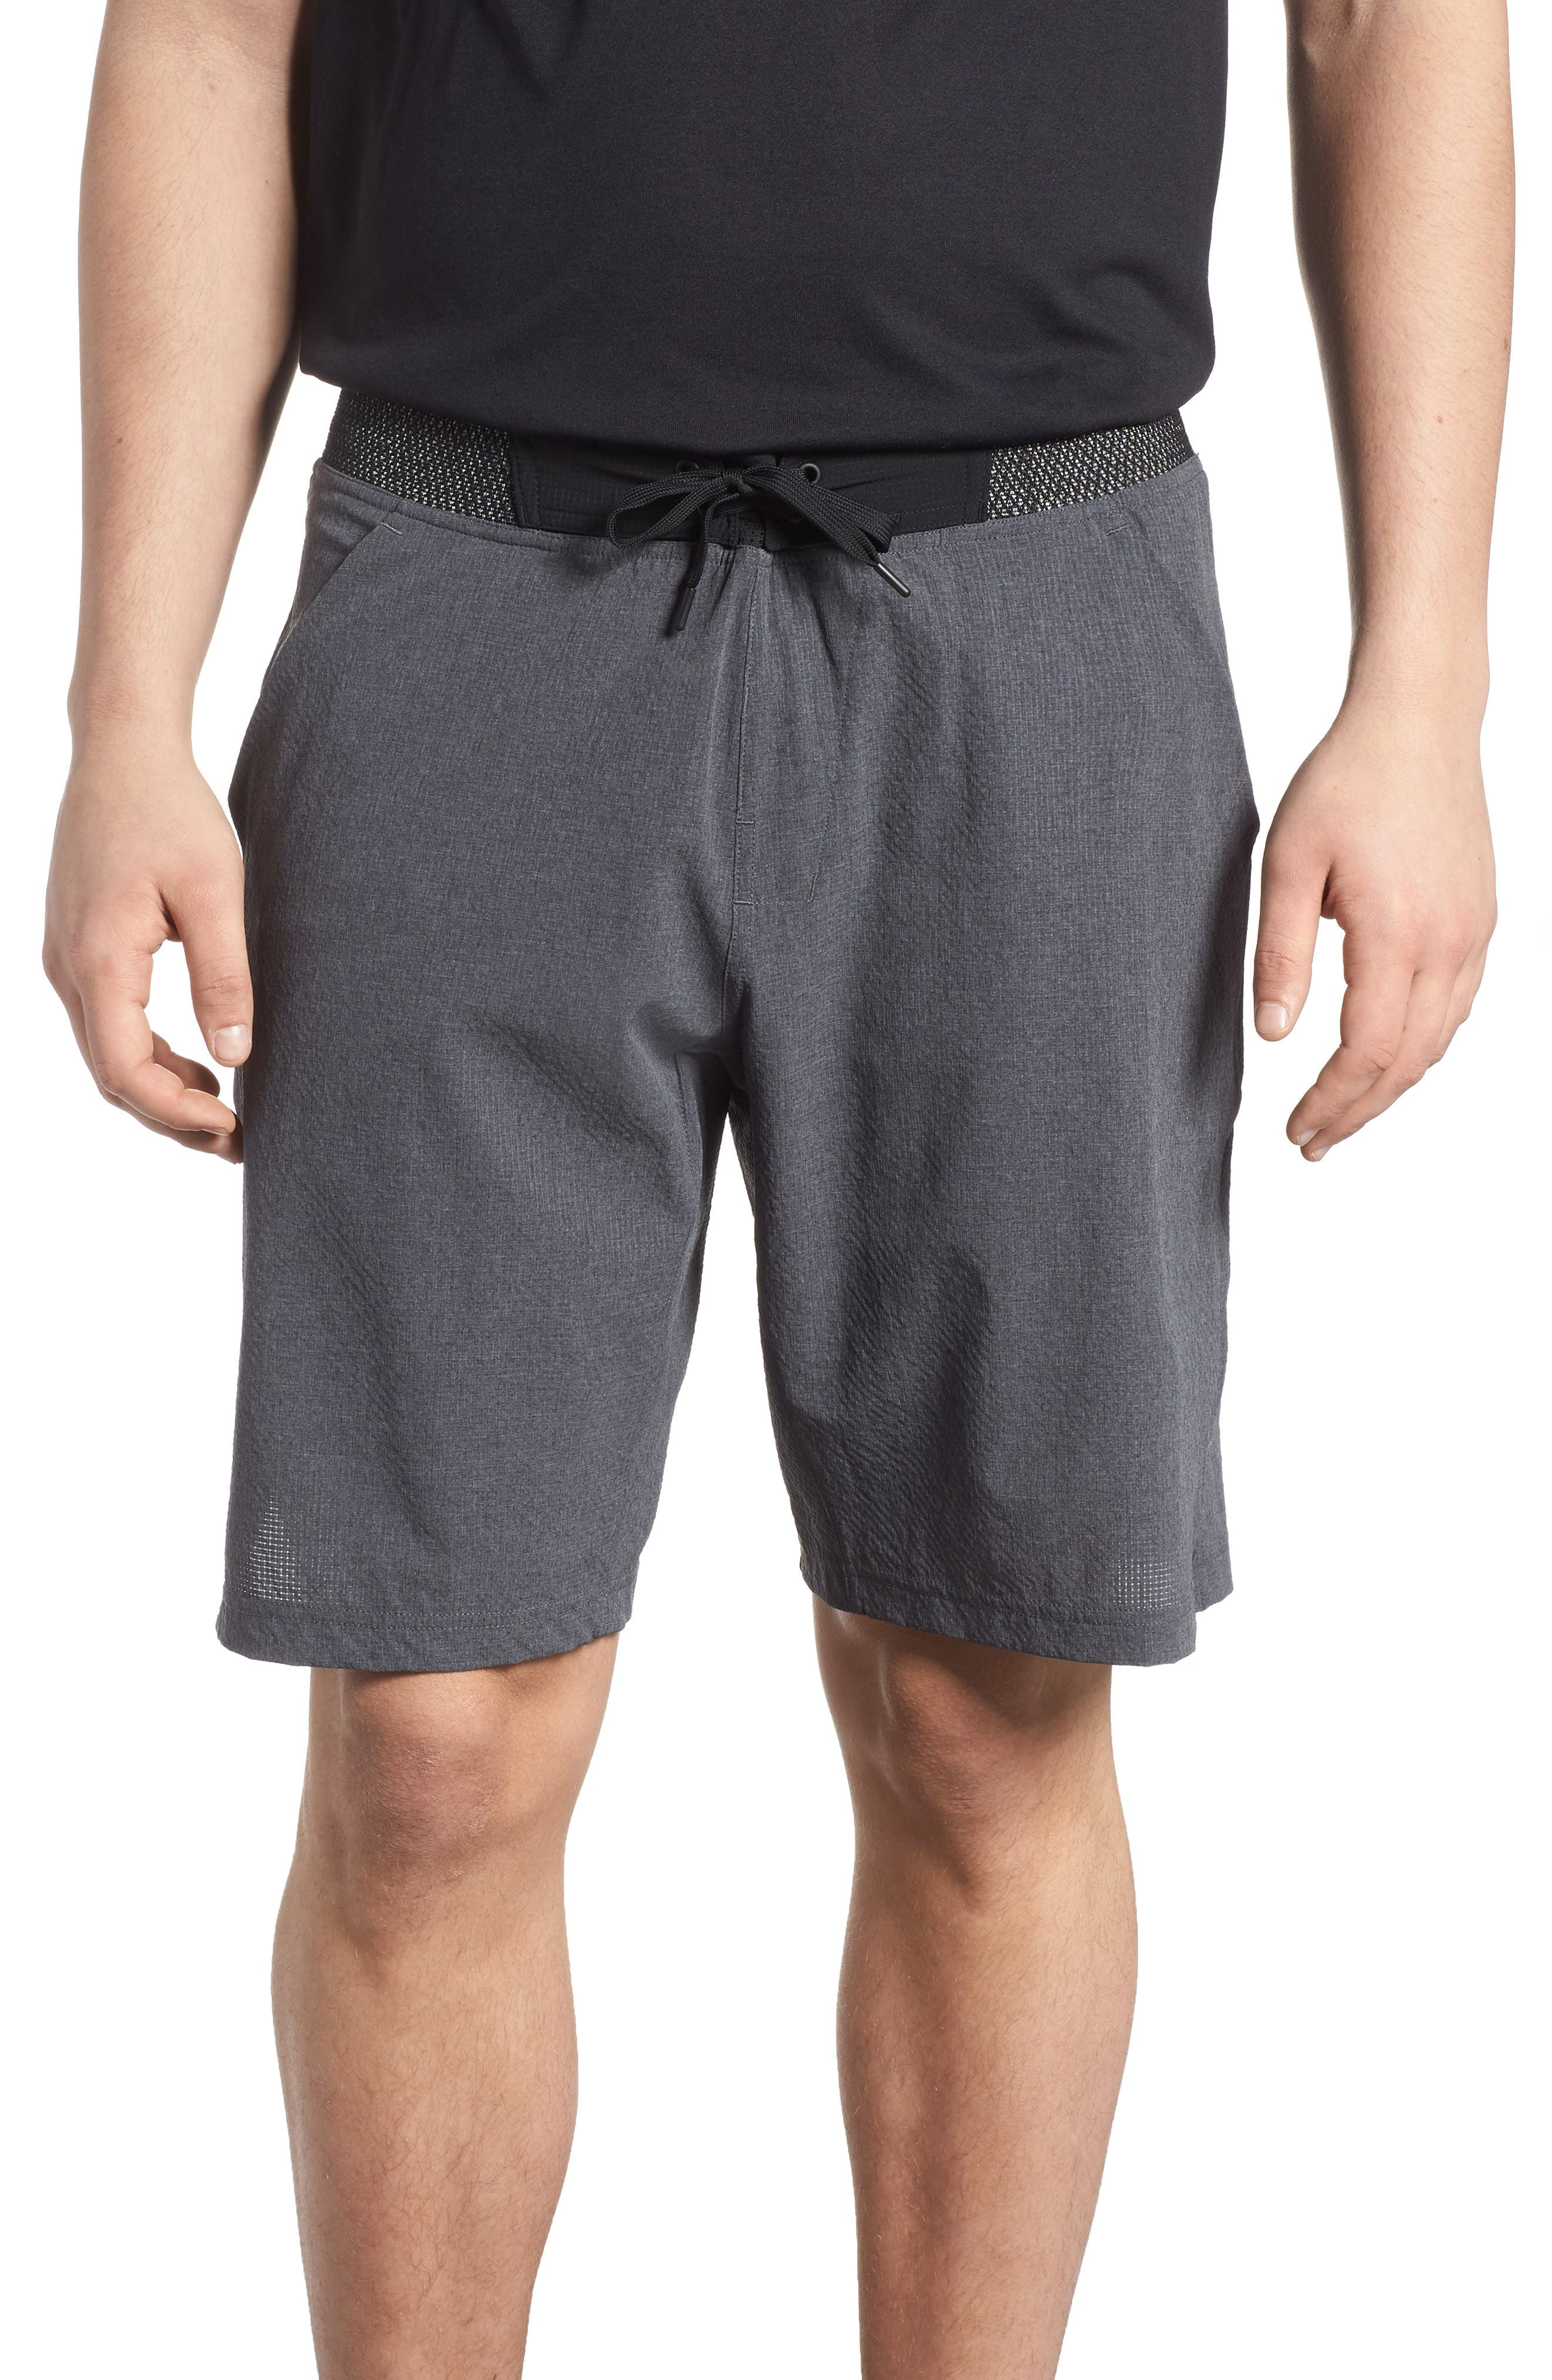 Reebok Epic Knit Shorts